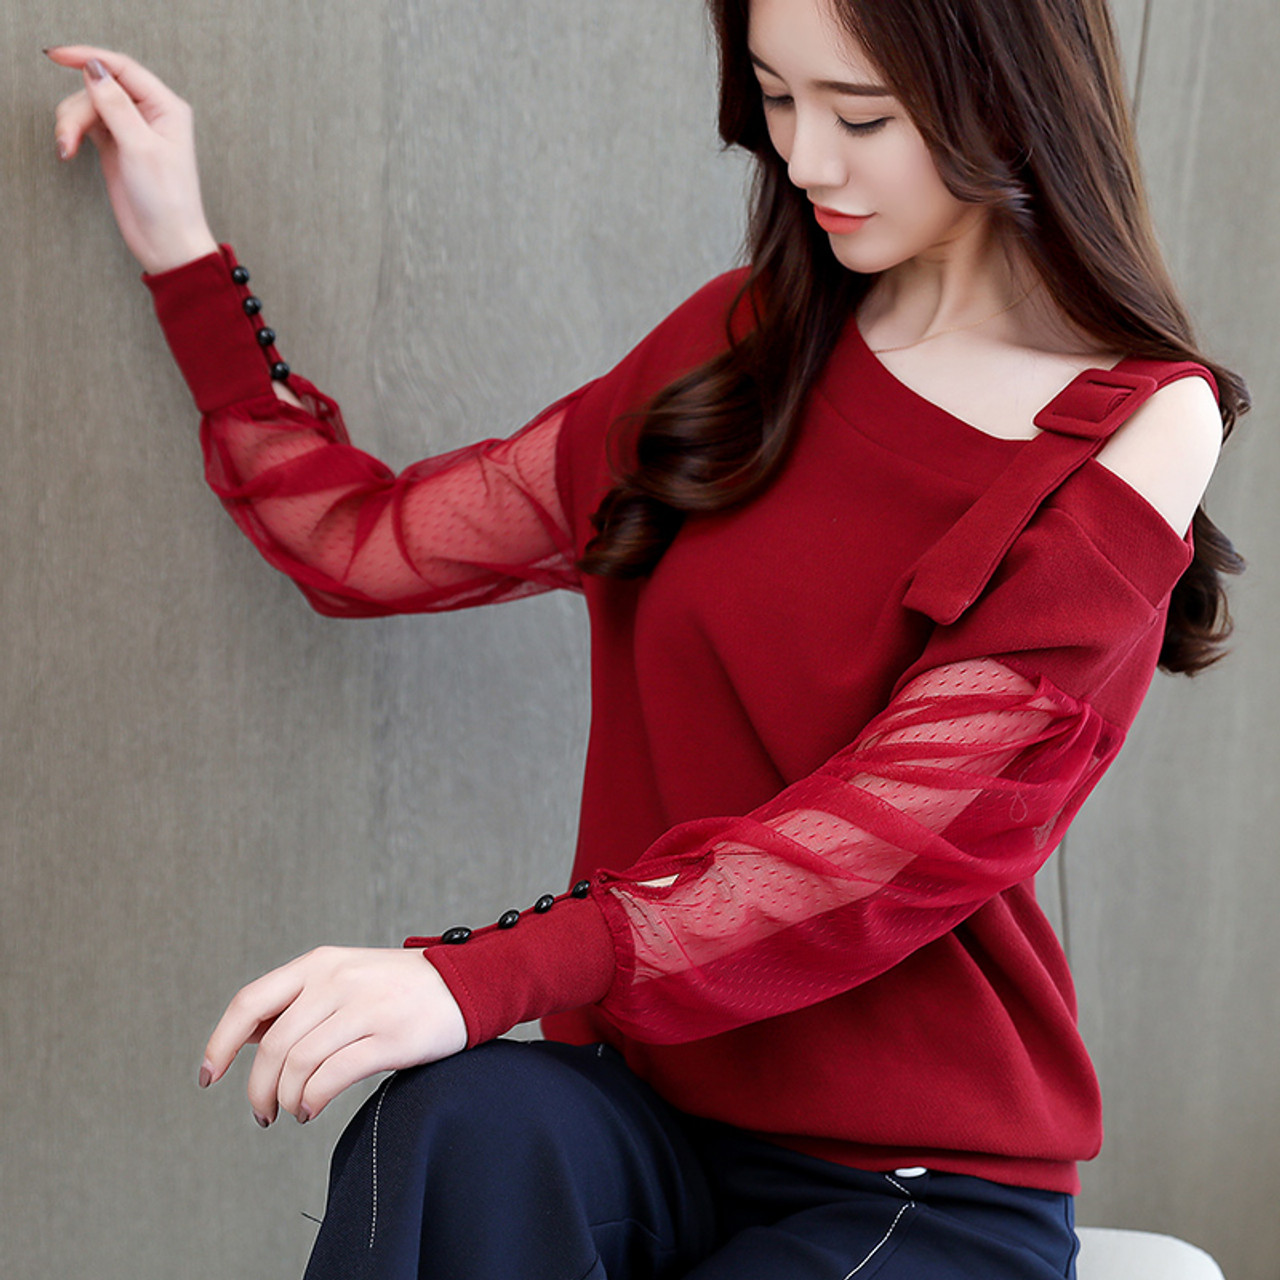 613e44a8553e9 ... Autumn long sleeve shirt women fashion woman blouses 2018 sexy off  shoulder top solid women blouse ...